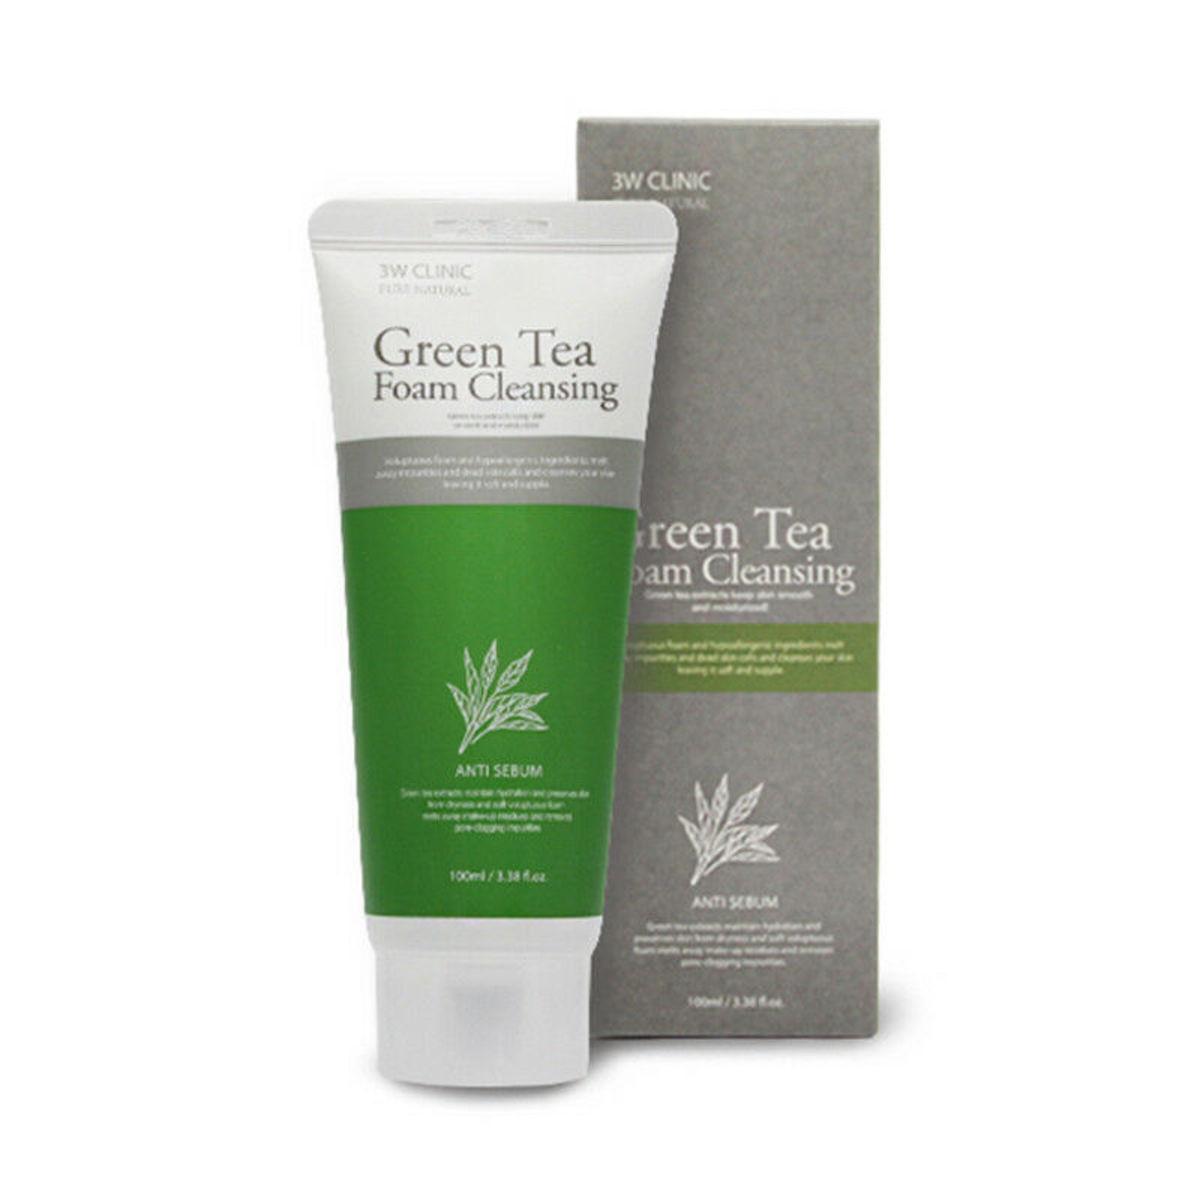 Green Tea Foam Cleansing 100ml